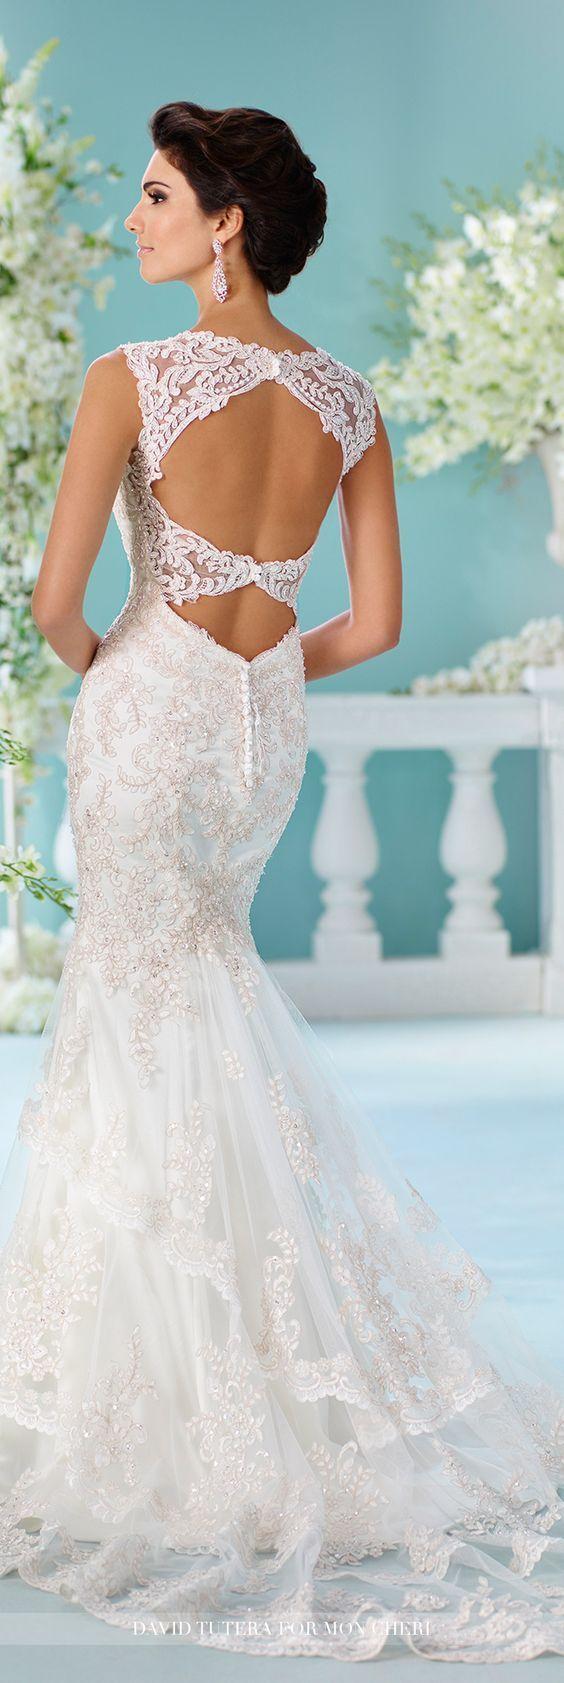 Wedding Dress Inspiration - David Tutera | David tutera, Dress ideas ...